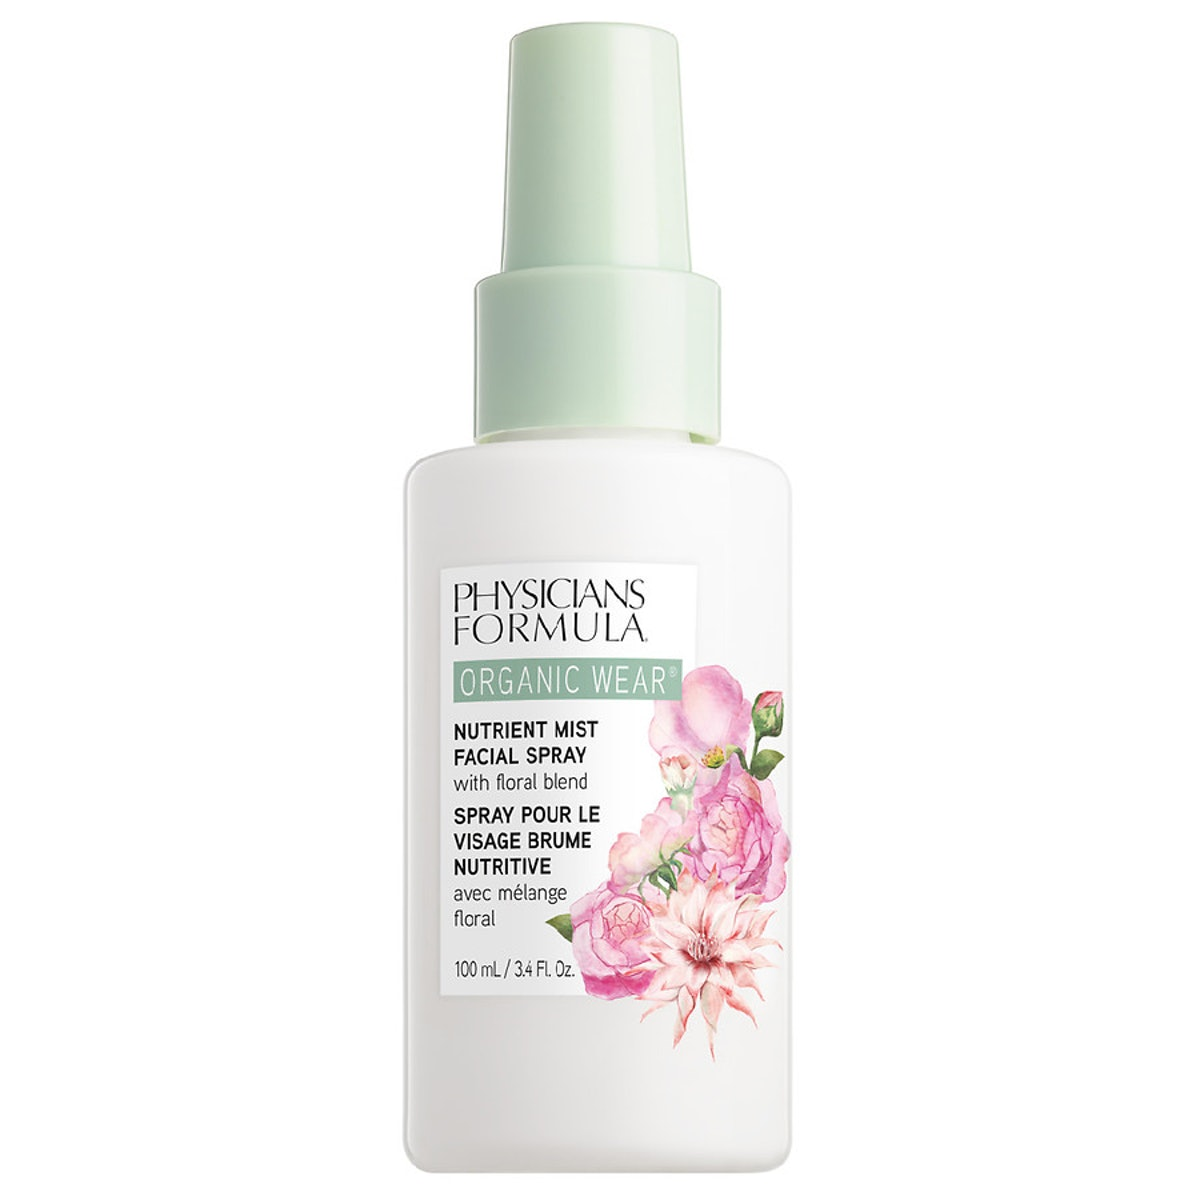 Organic Wear Nutrient Mist Facial Spray